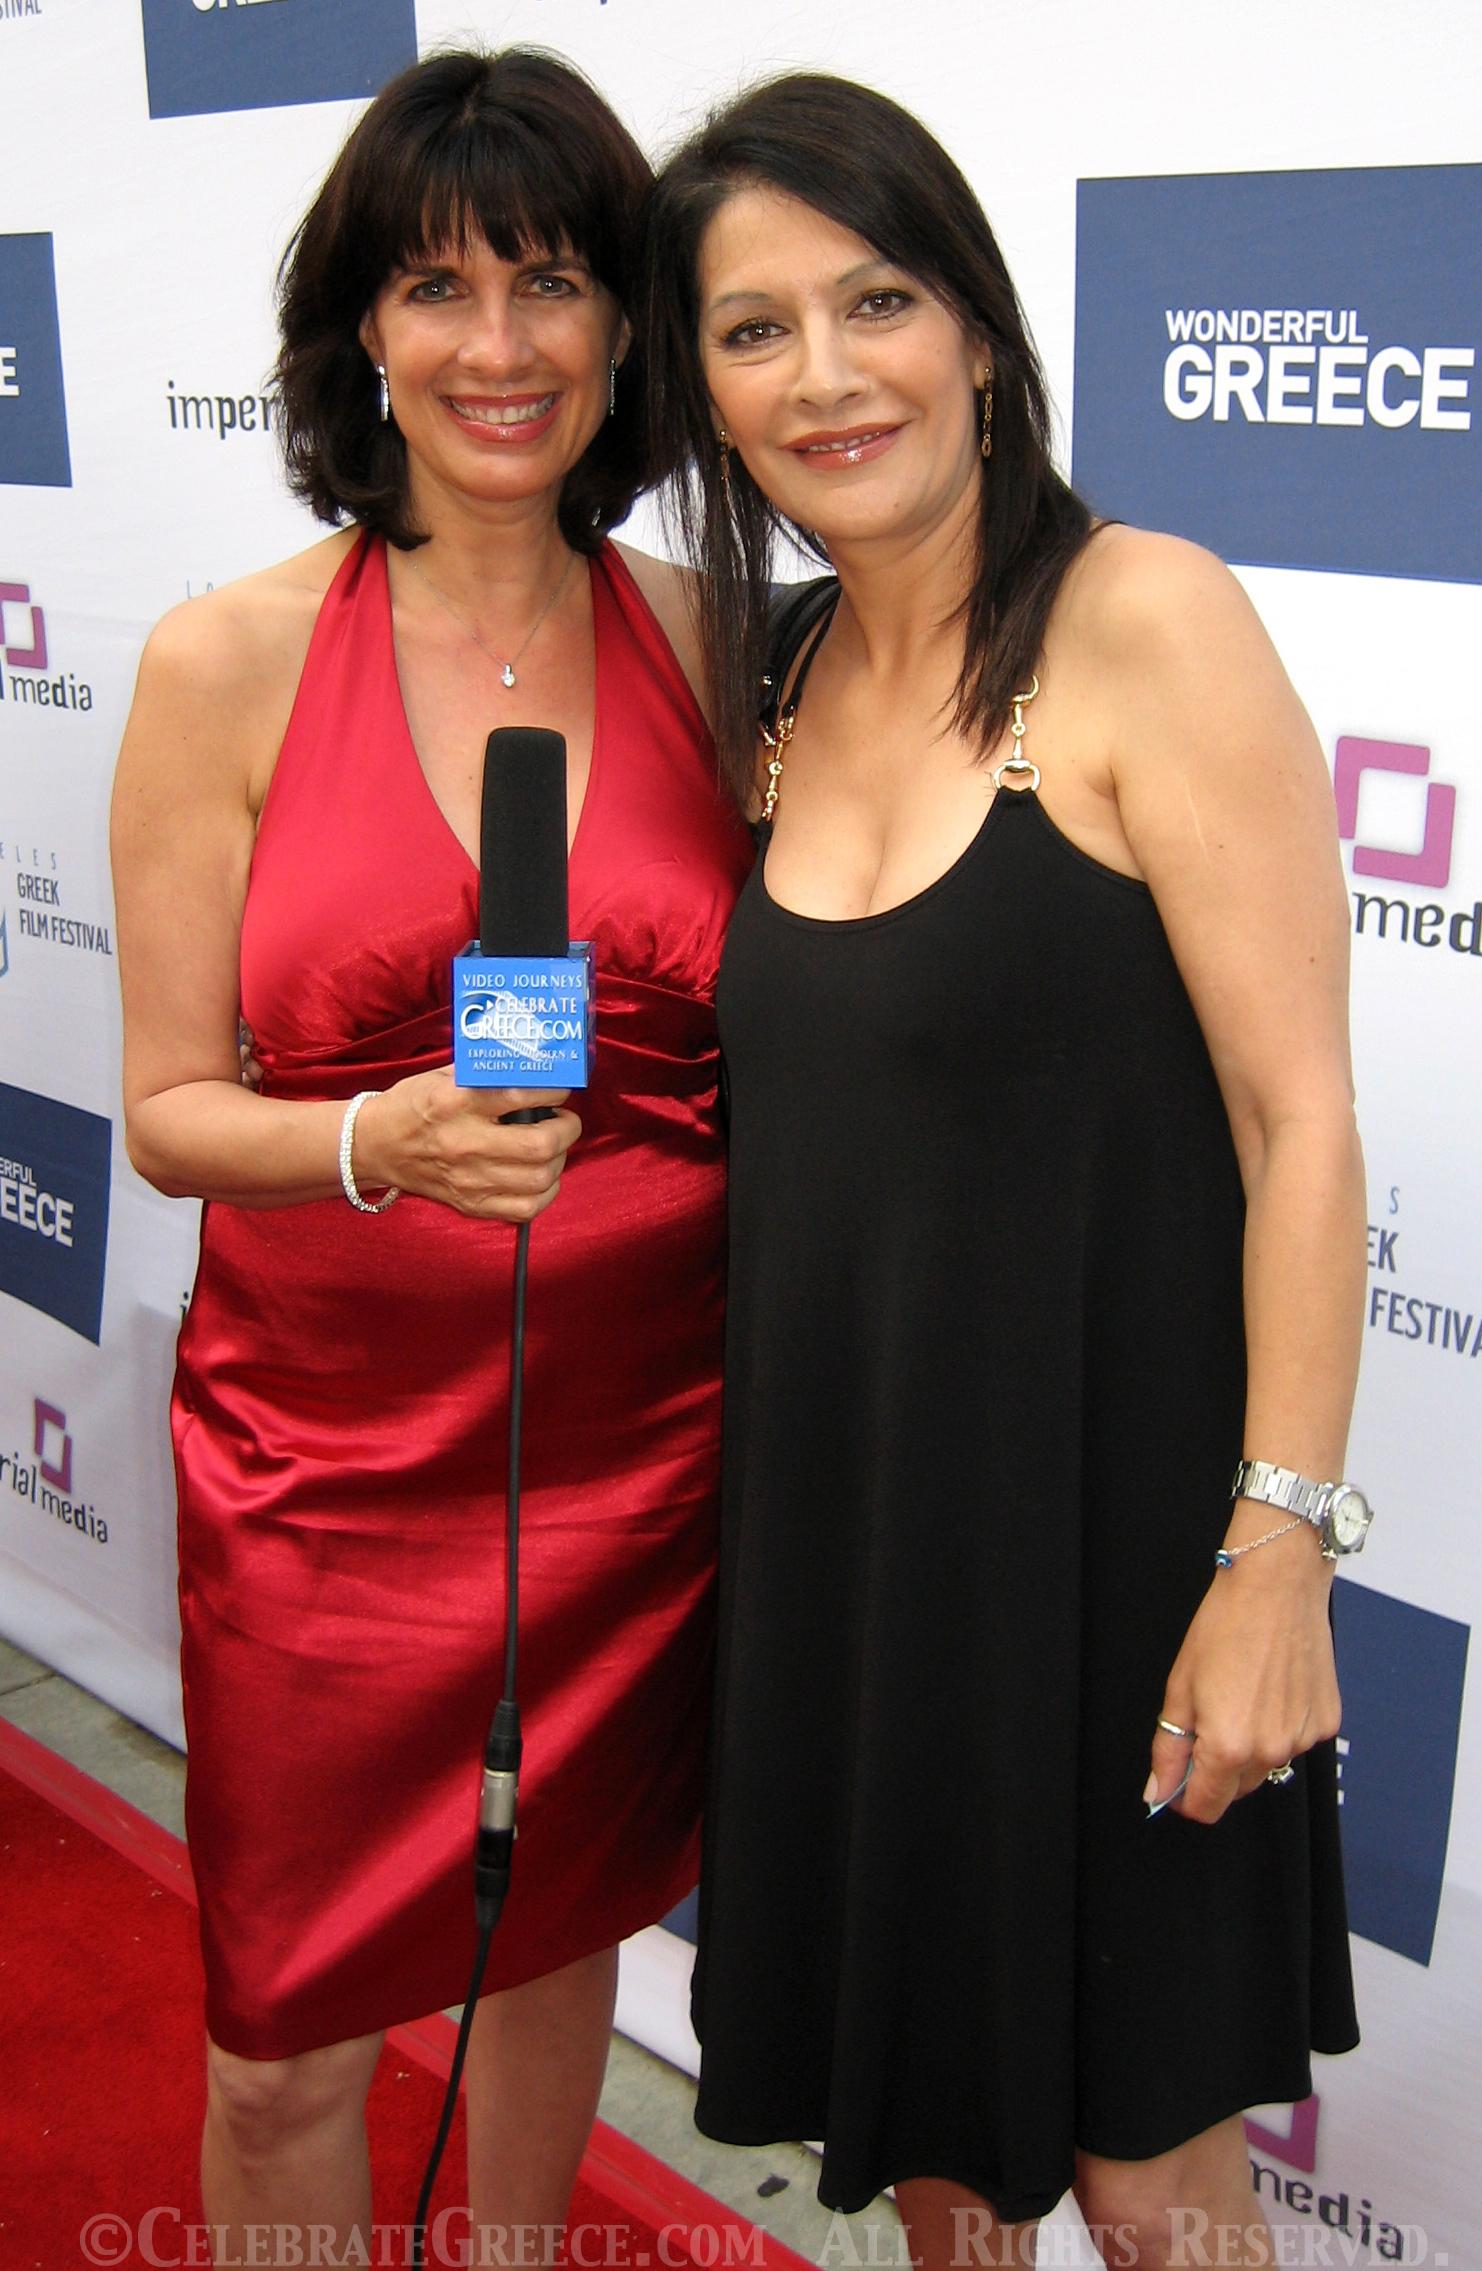 Marina Sirtis, Actress best known for Star Trek: Next Generation